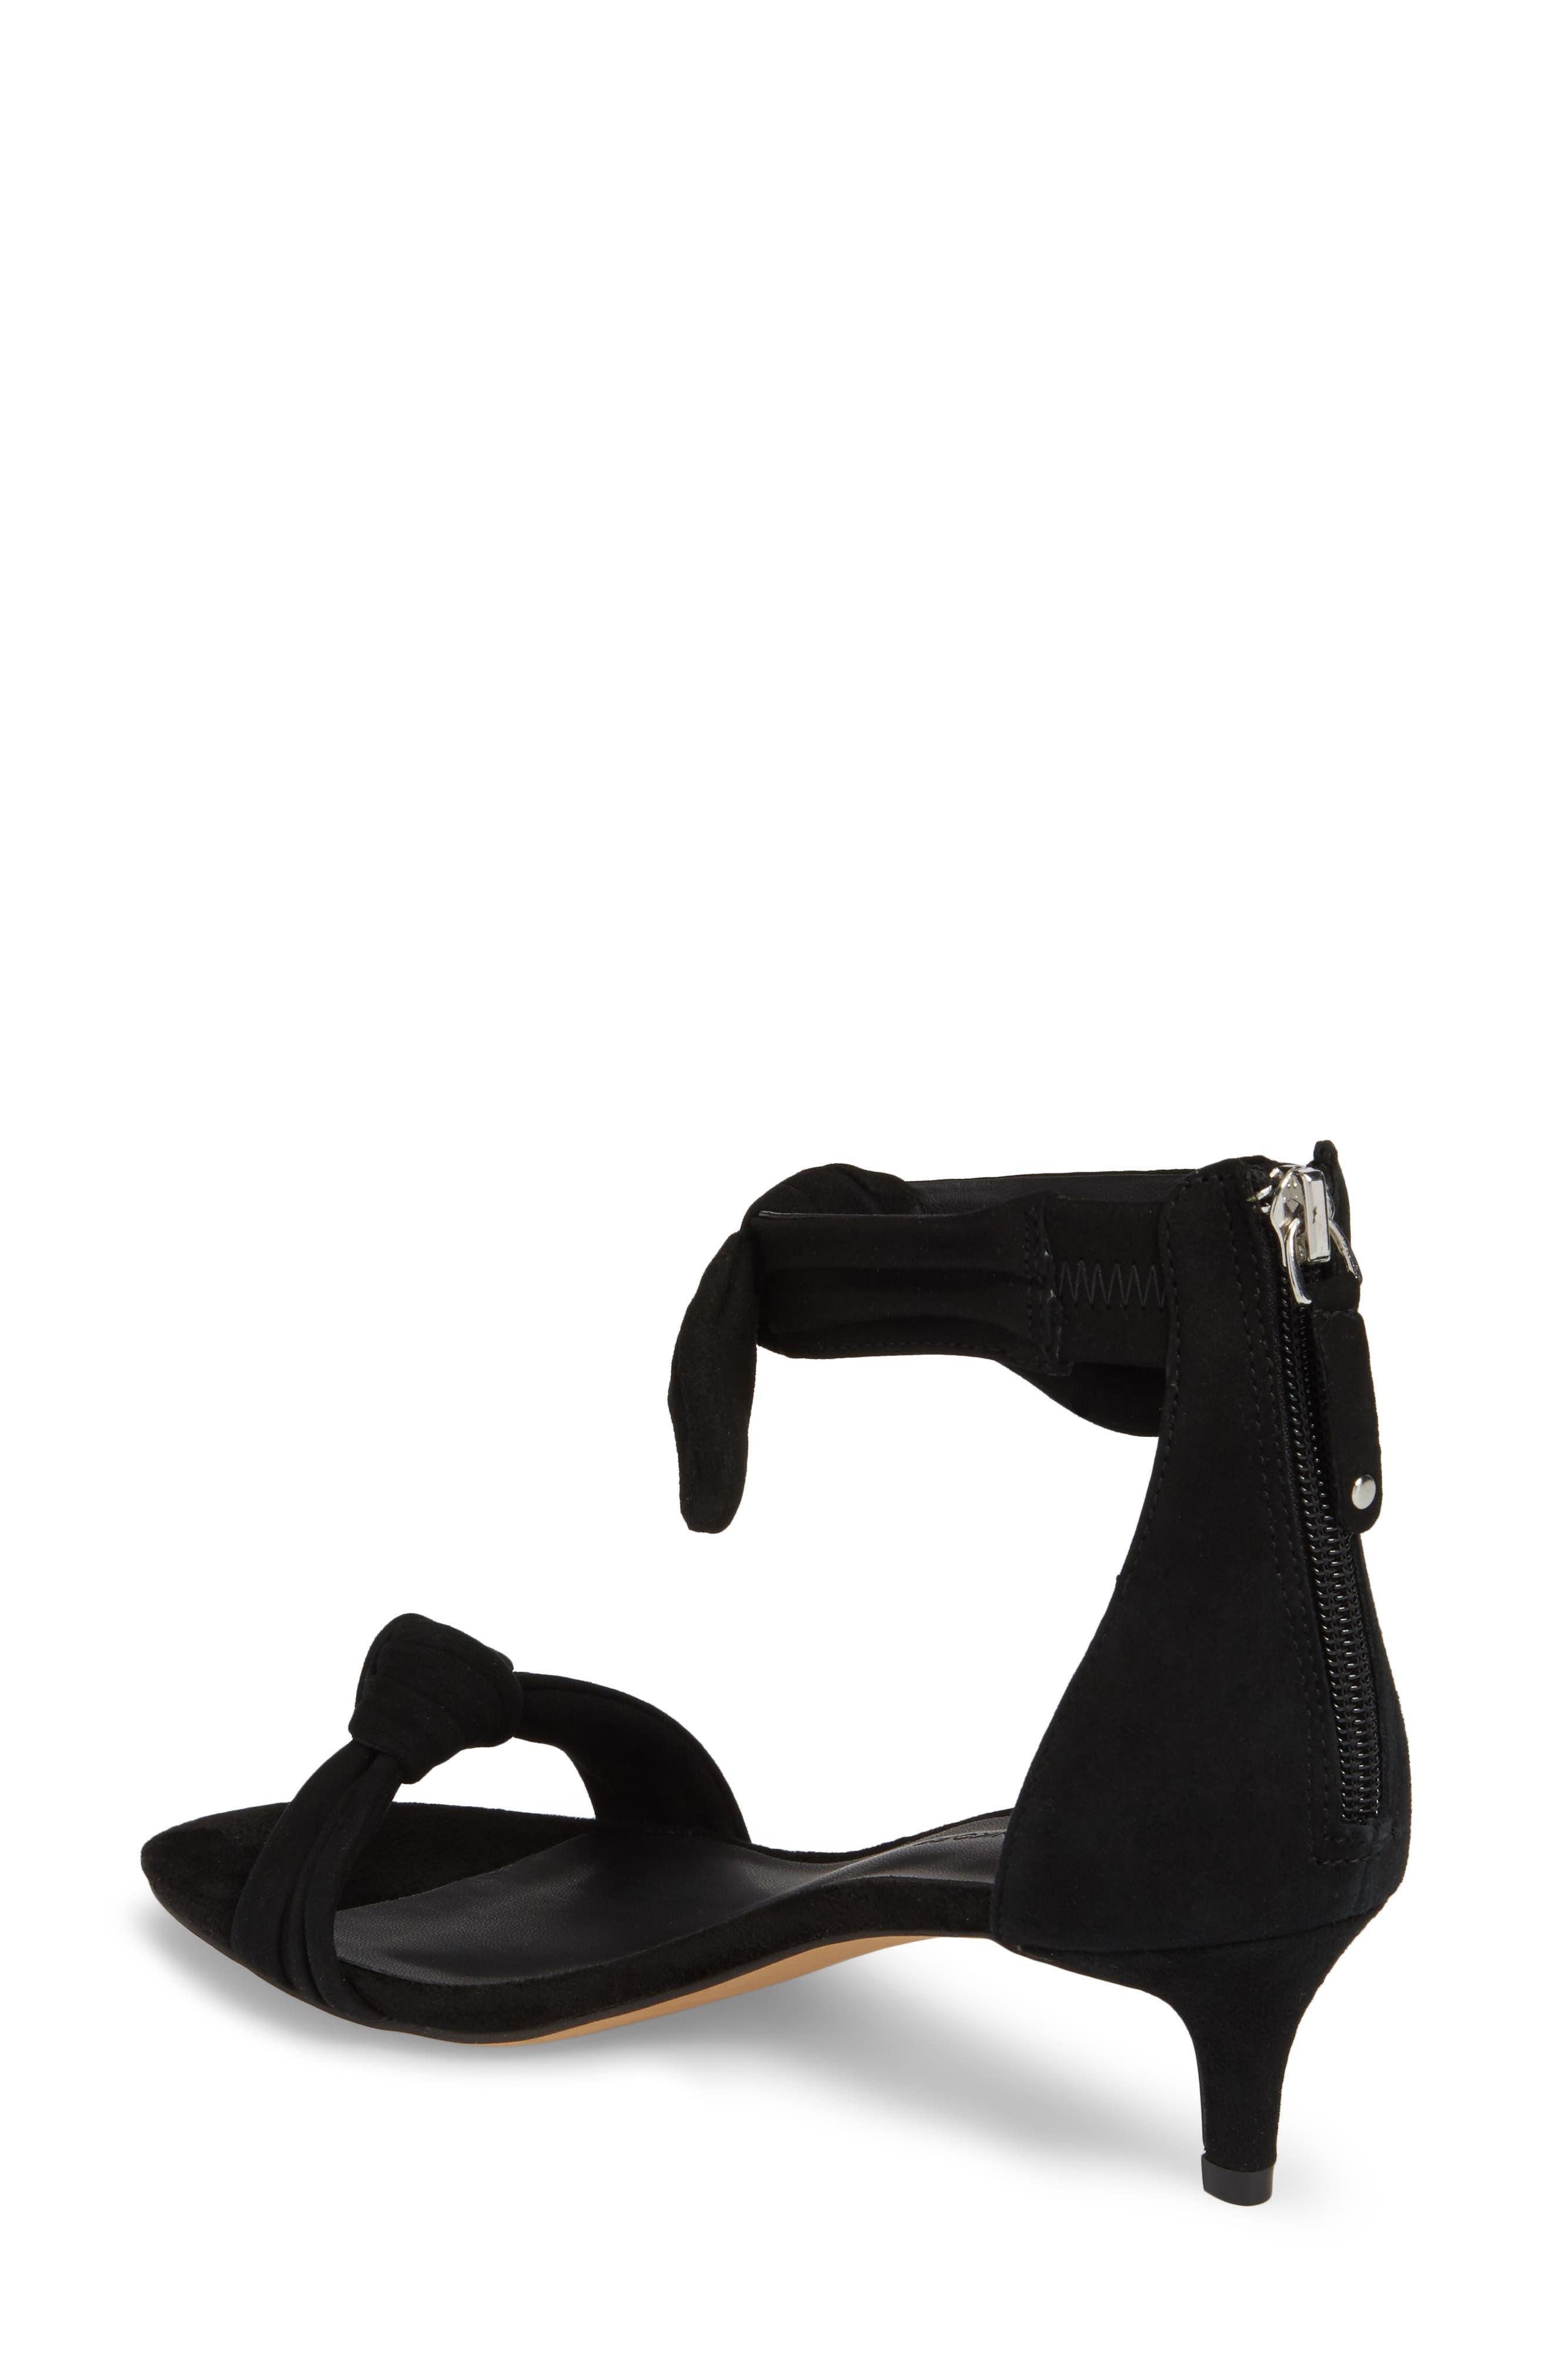 Alternate Image 2  - Rebecca Minkoff Kaley Knotted Kitten Heel Sandal (Women)